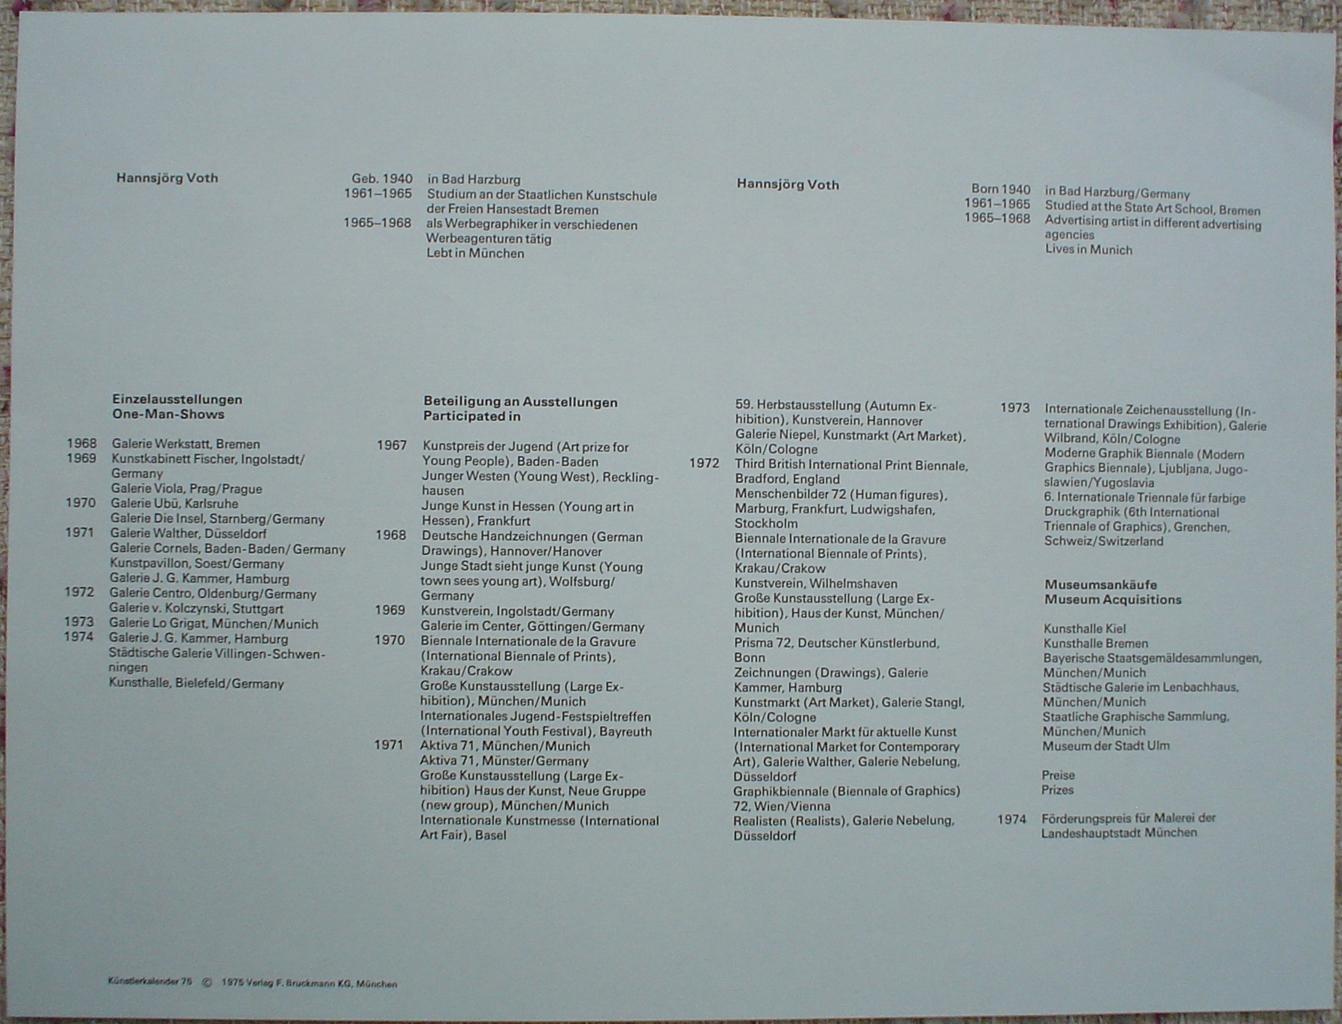 "Gray Stitched Shape Abstract (untitled) by Hannsjörg Voth, to show accompanying Artist Biography - from ""Künstlerkalendar '75"" , an oversized calendar featuring original serigraphs from 13 European artists, © 1975 Verlag F. Bruckmann KG, München (Bruckmann Publishing, Munich)"